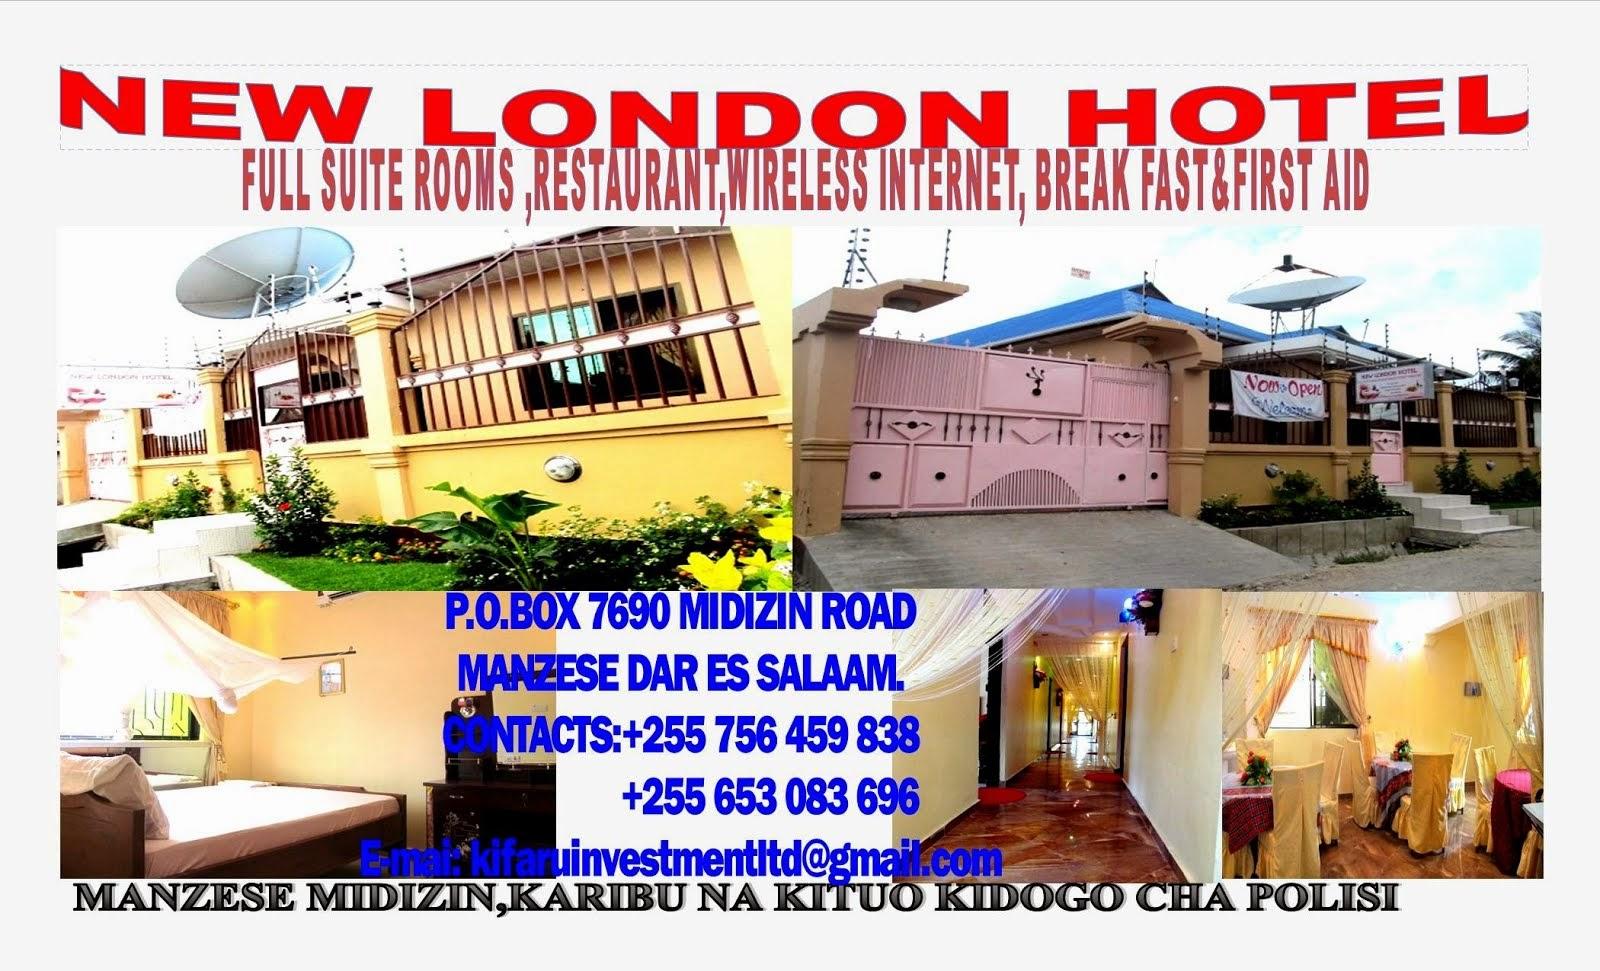 NEW LONDON HOTEL